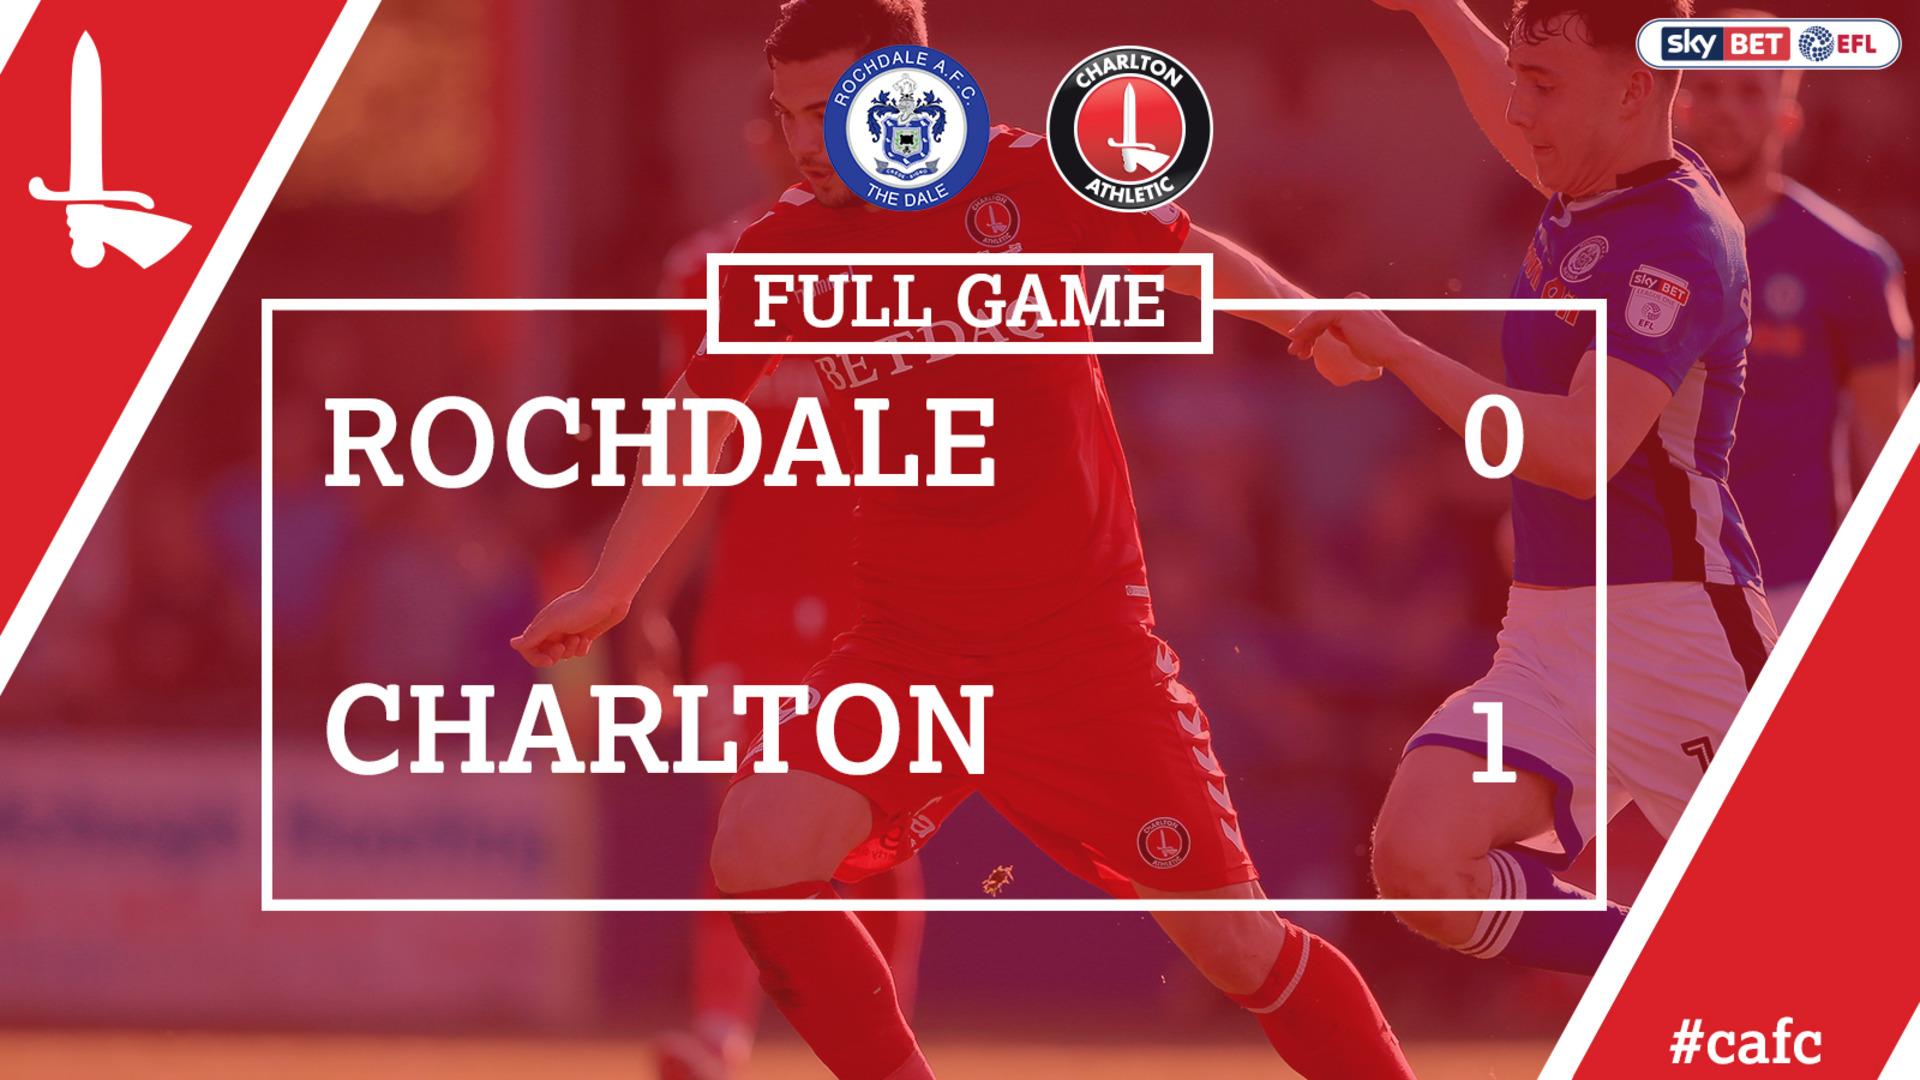 FULL GAME | Rochdale 1 Charlton 0 (May 2018)